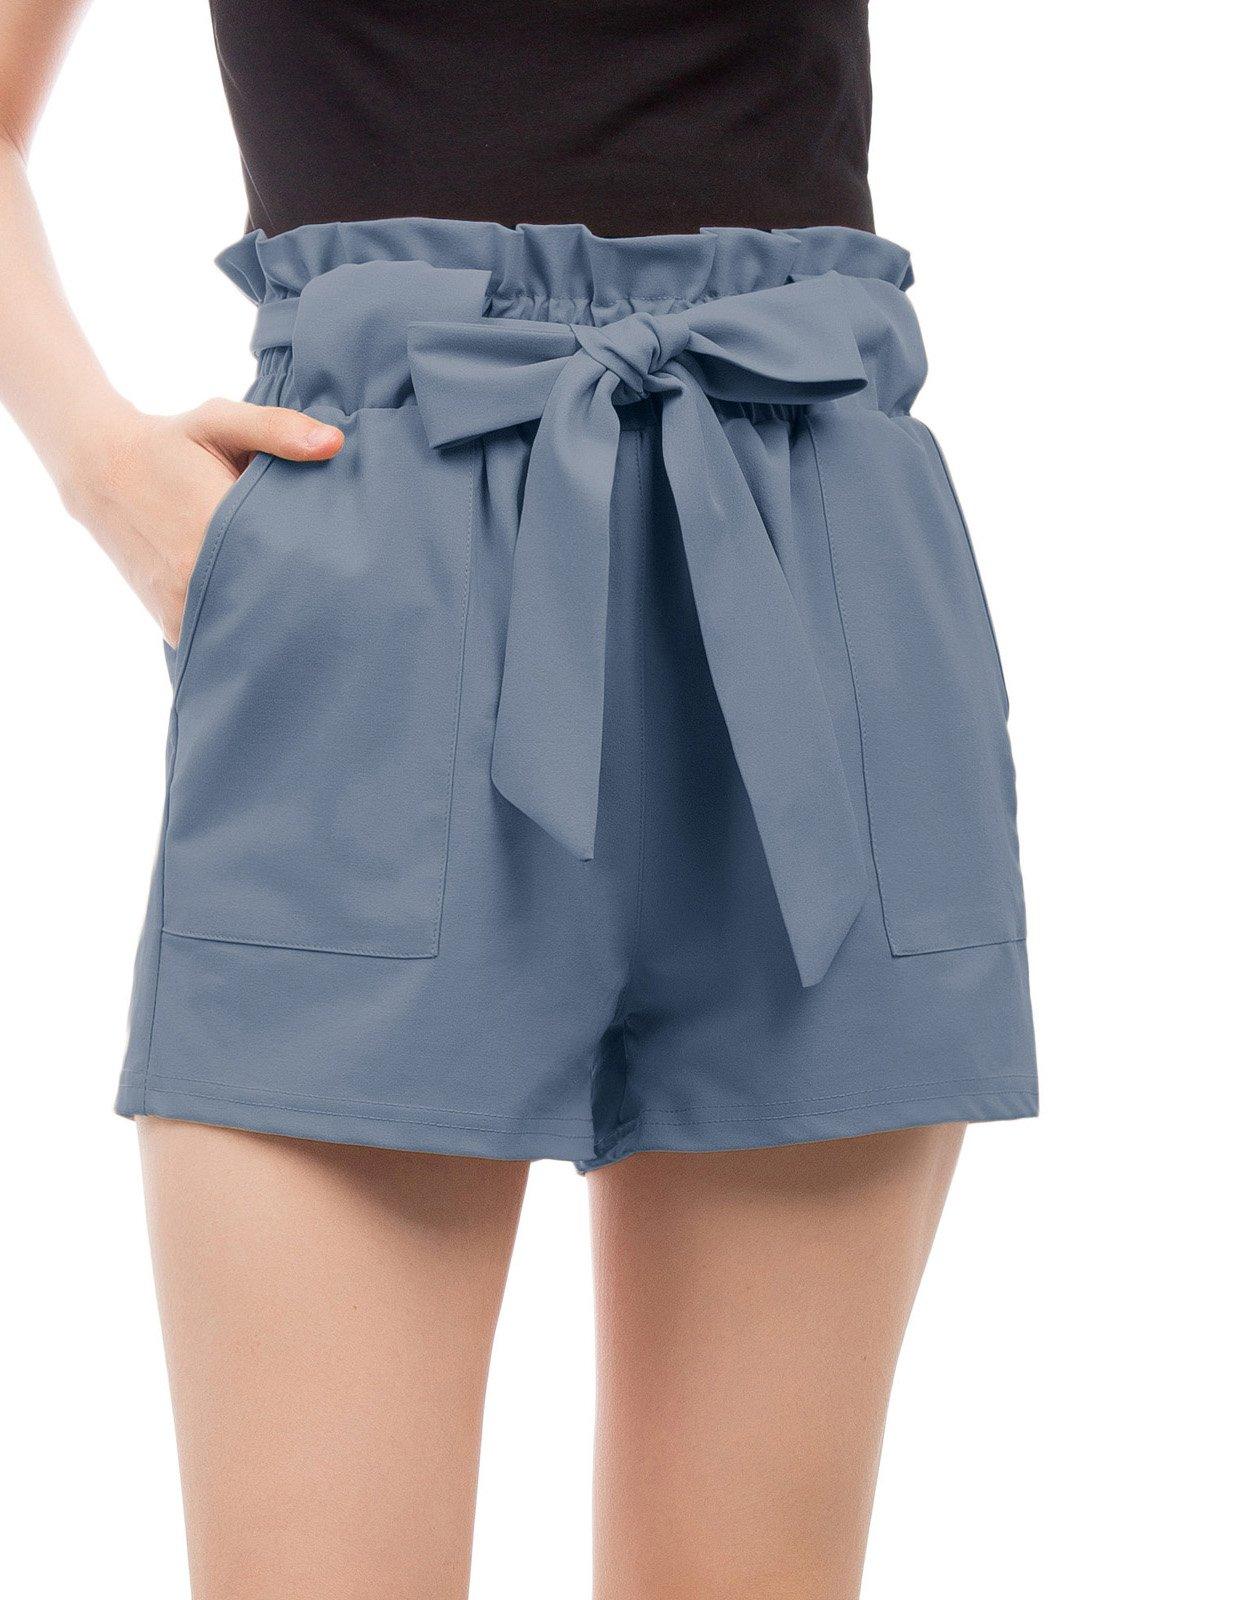 GRACE KARIN Women's High Waist Casual Frill Bowknot Shorts M Gray Blue-2